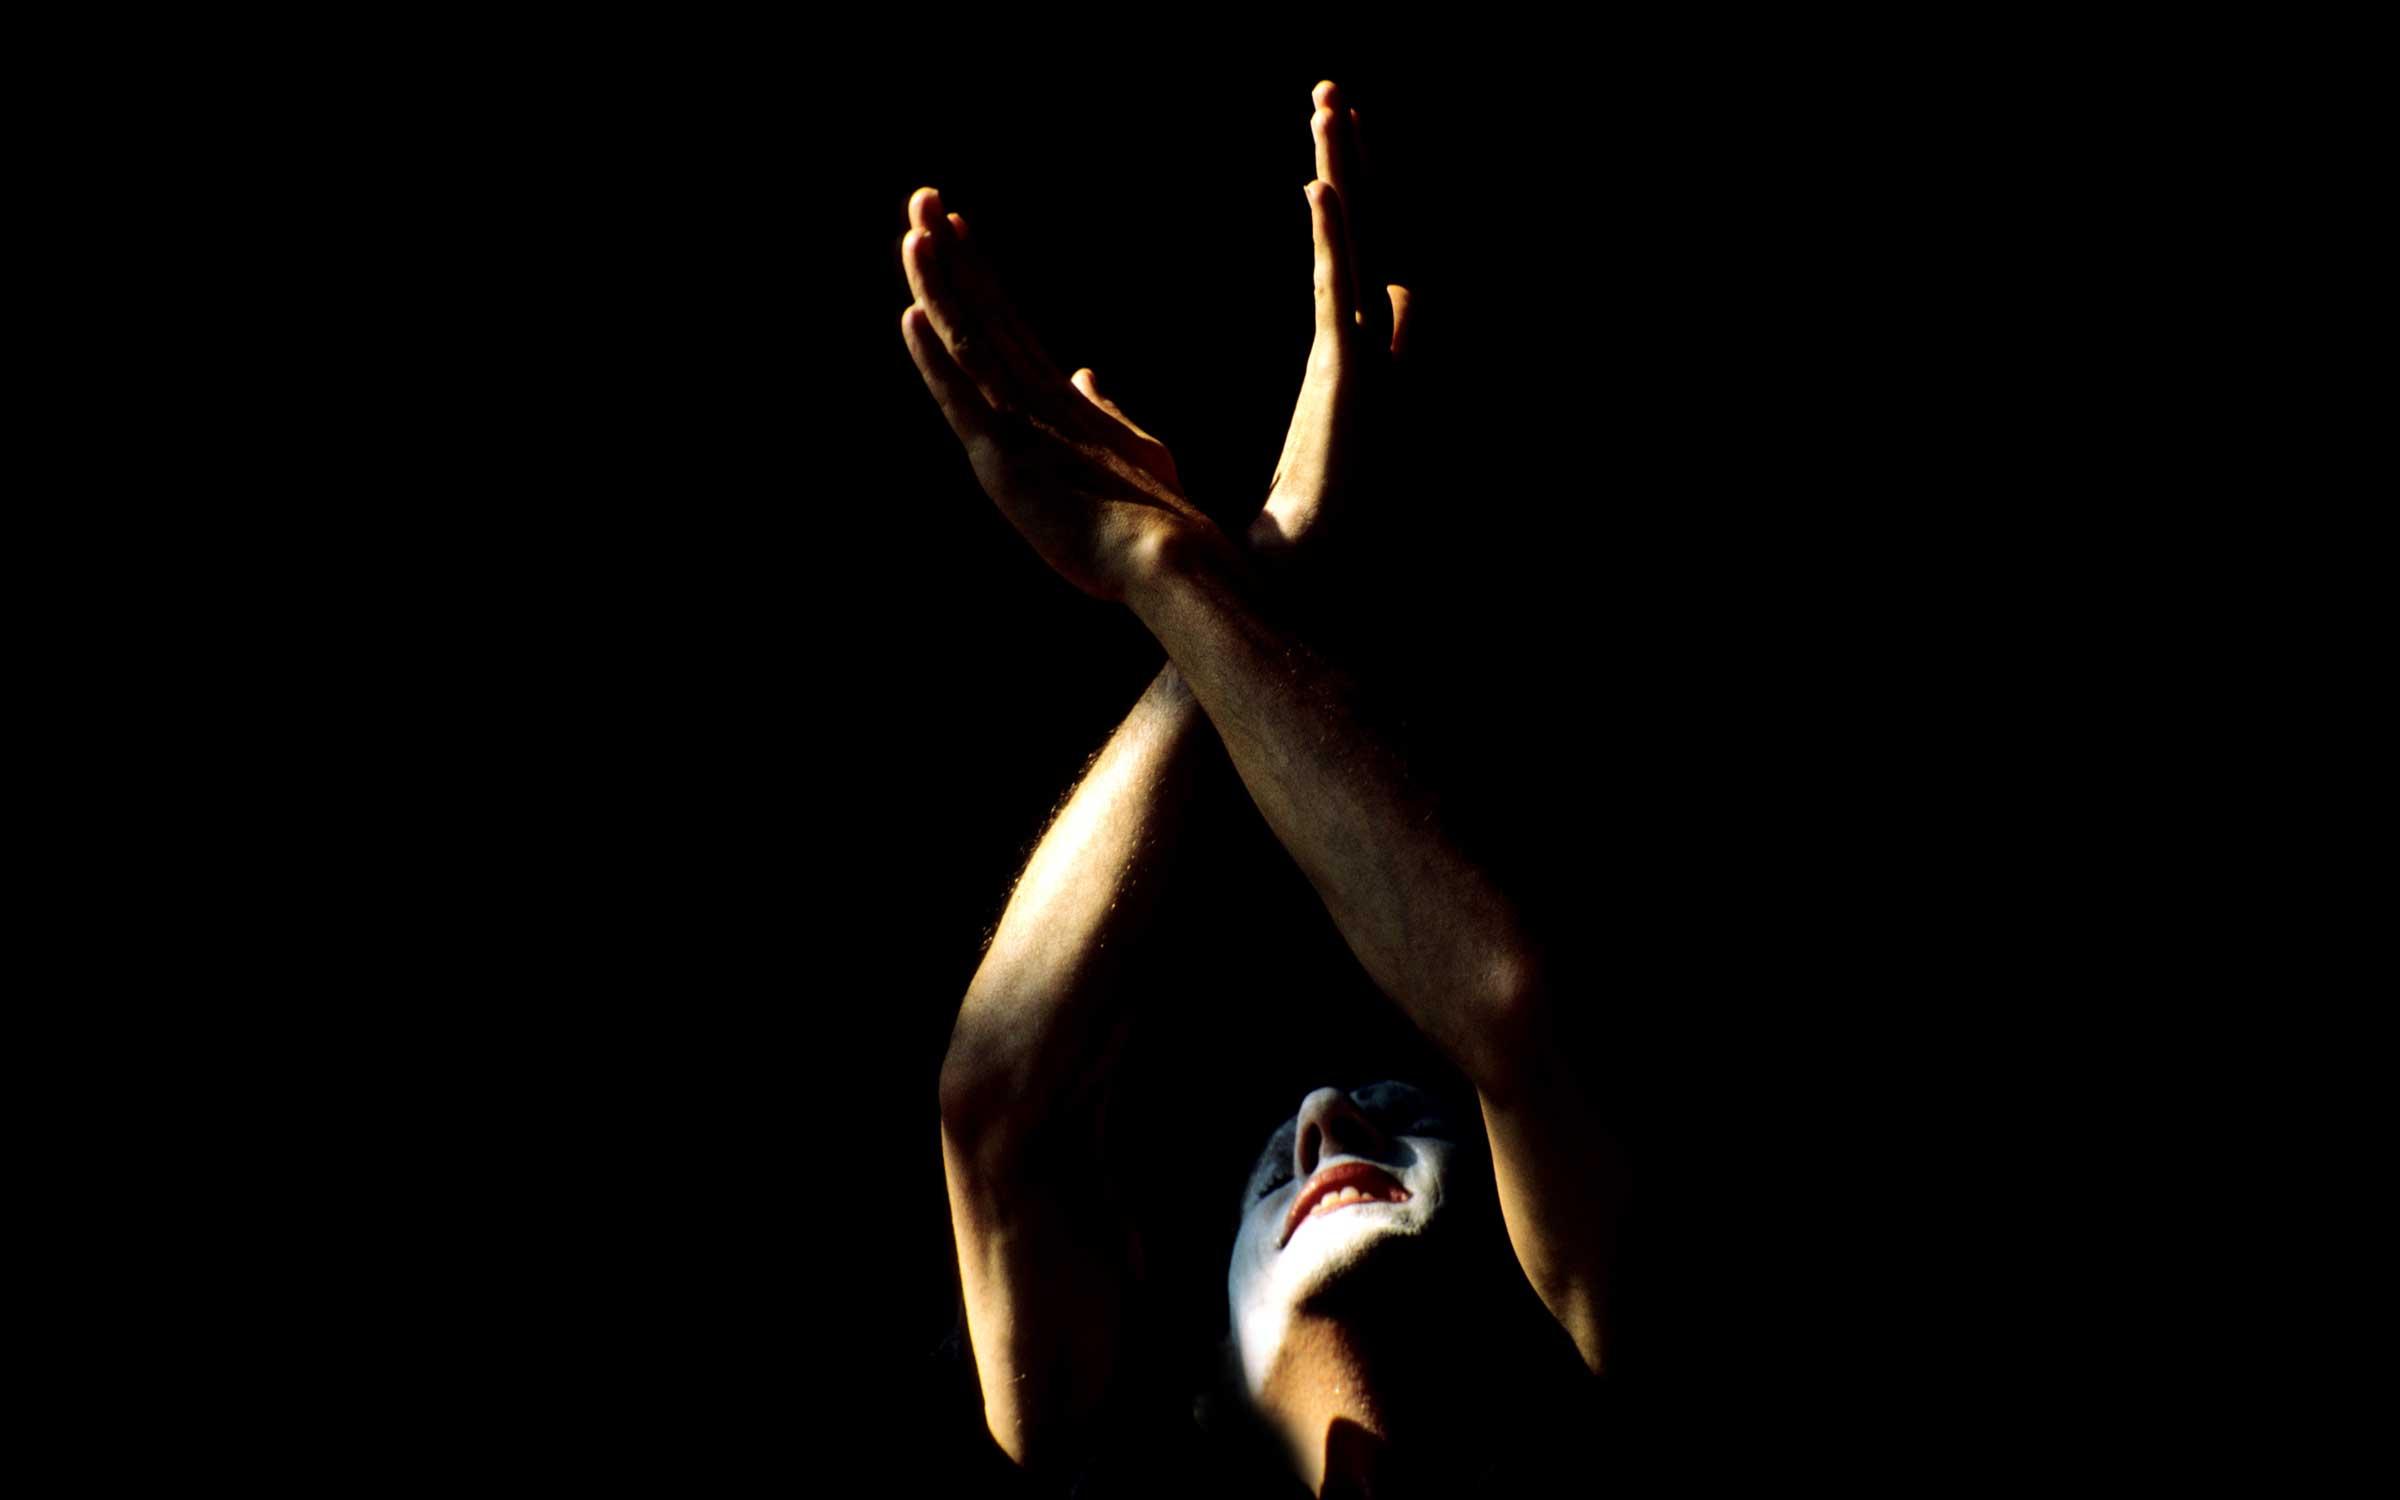 mime, pantomime, workshop, kurse, seminare. Grüß peter mim